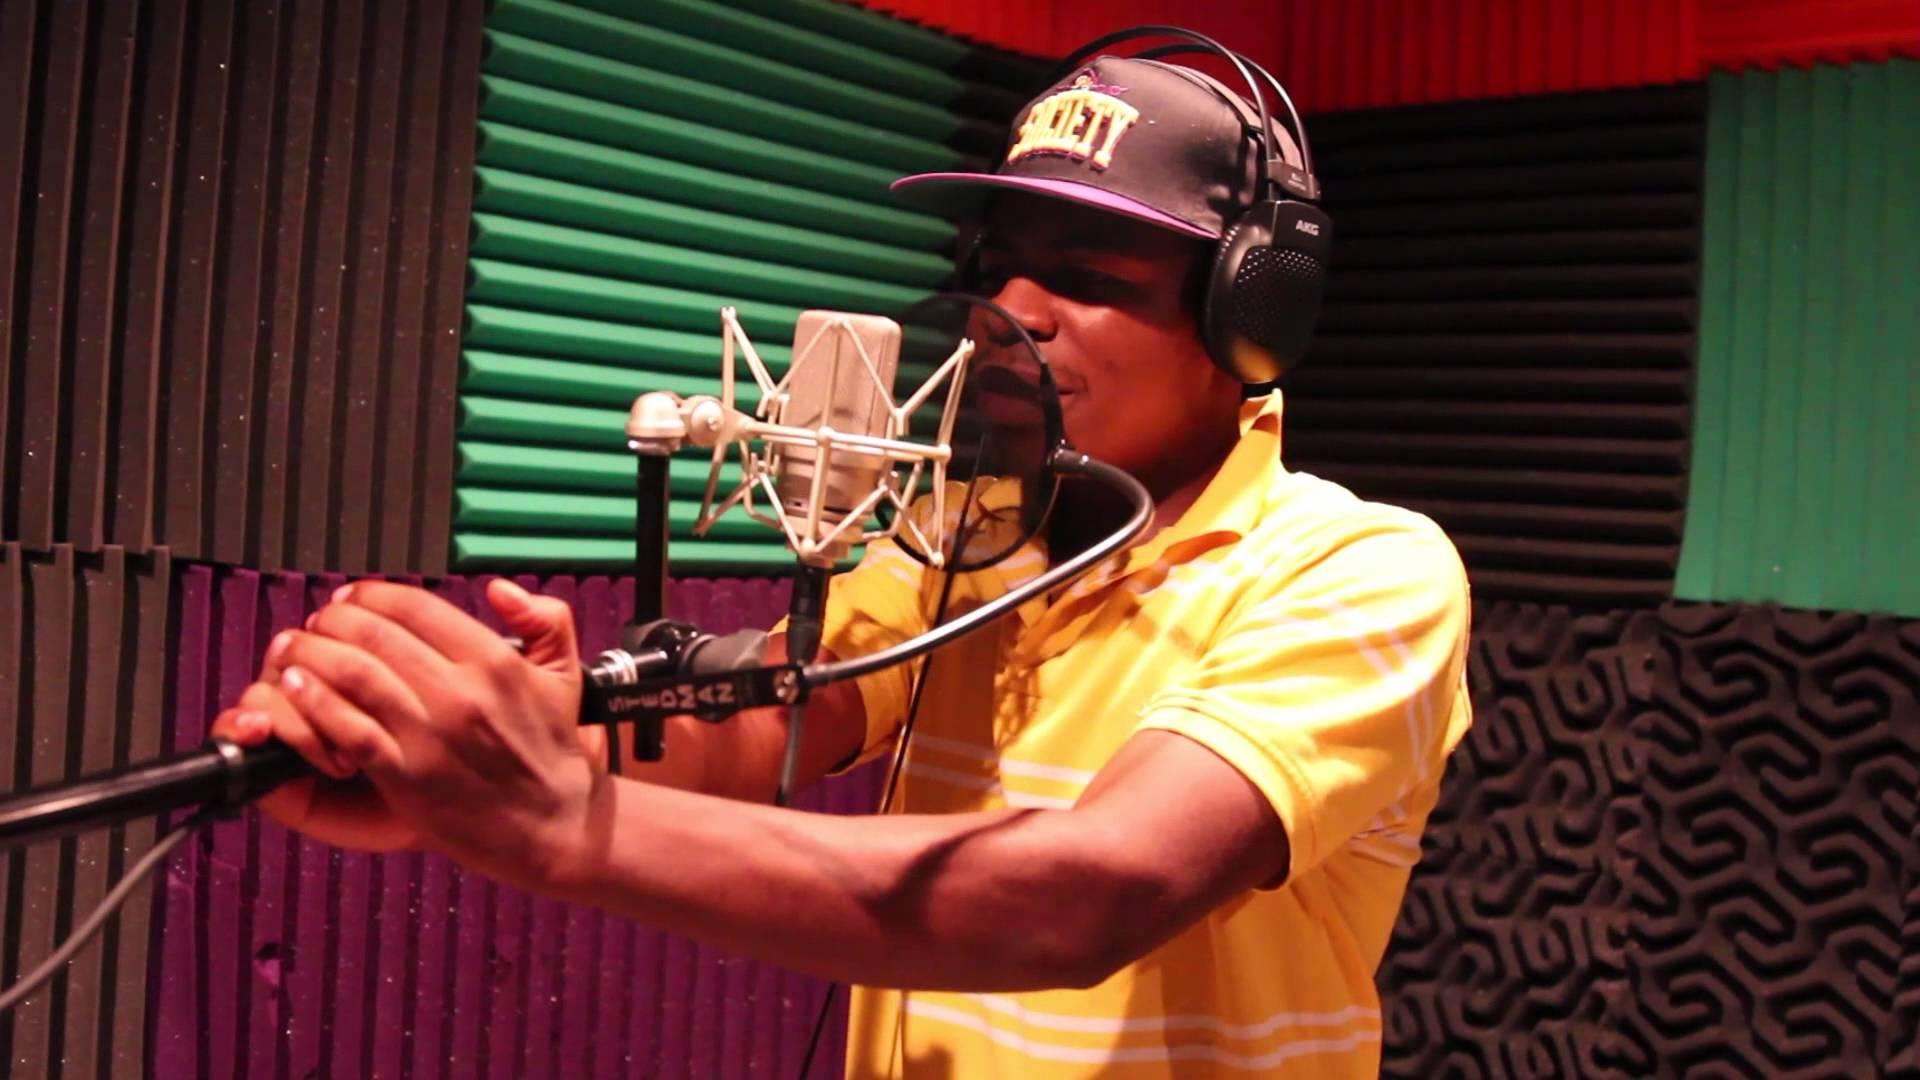 UBM News | Best Burundian & Tanzanian films online – Adabu